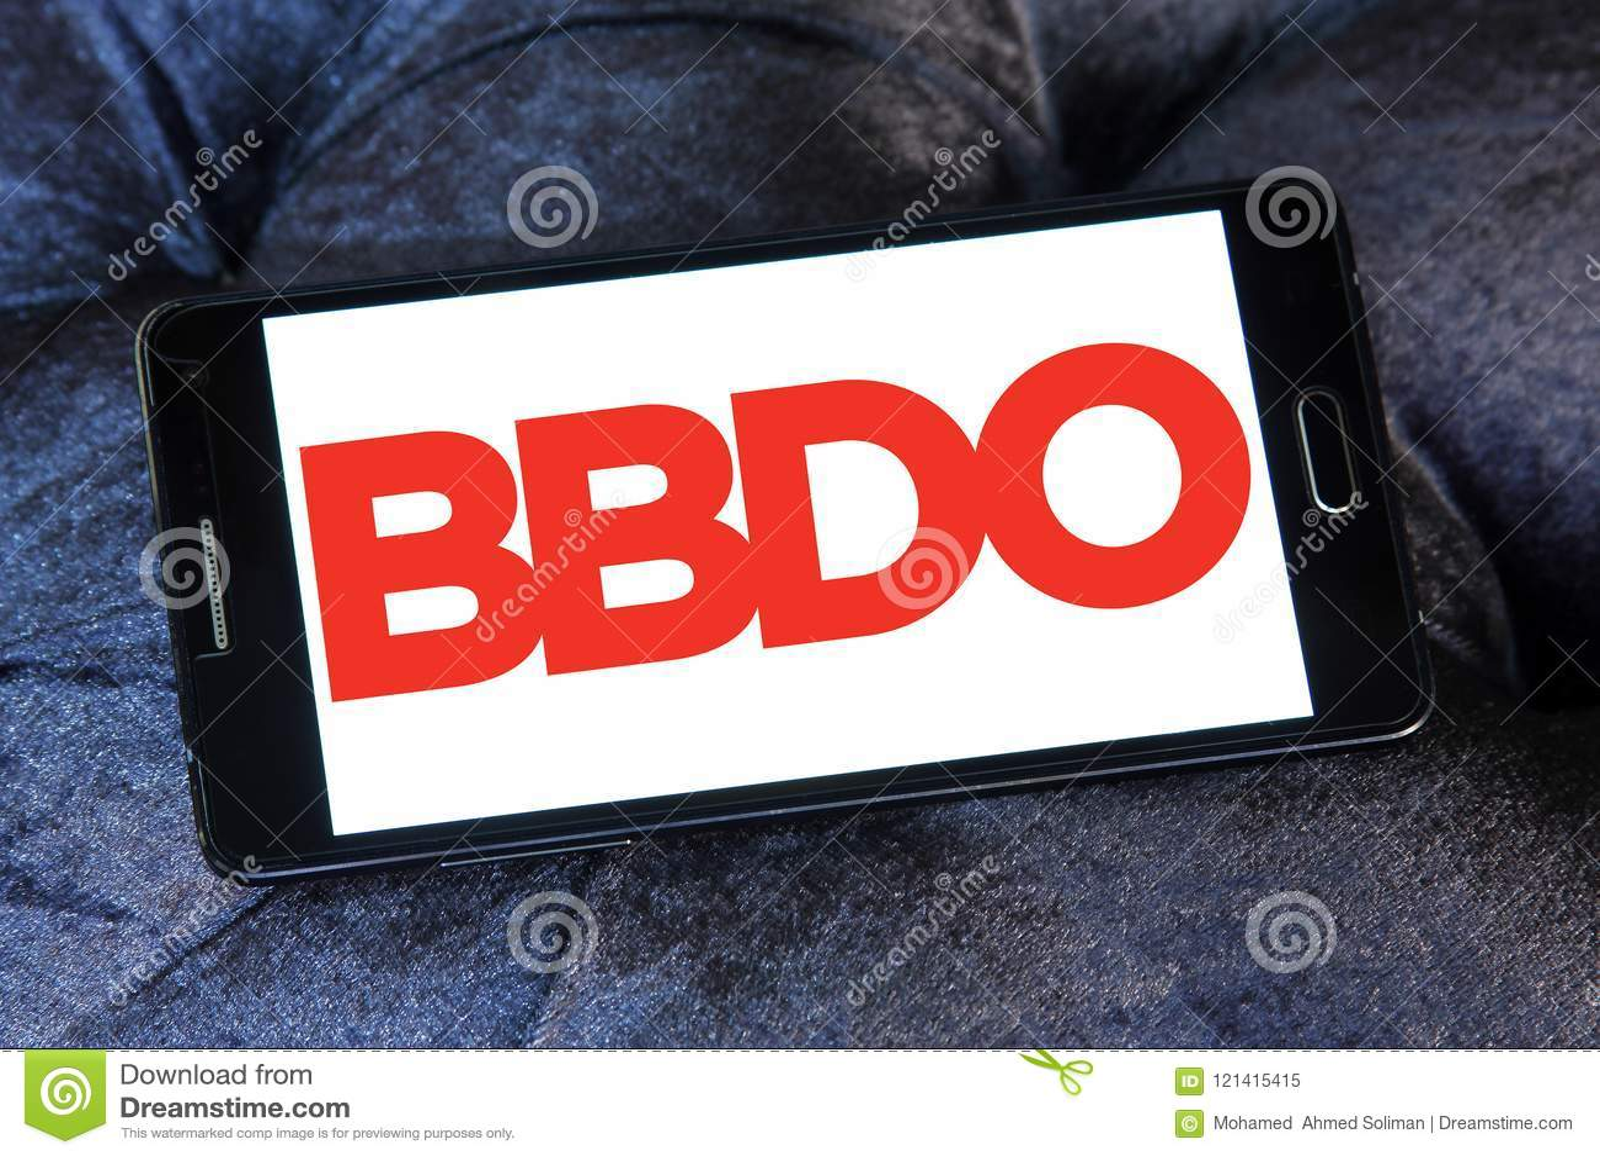 BBDO Advertising Agency Logo Editorial Image - Image of